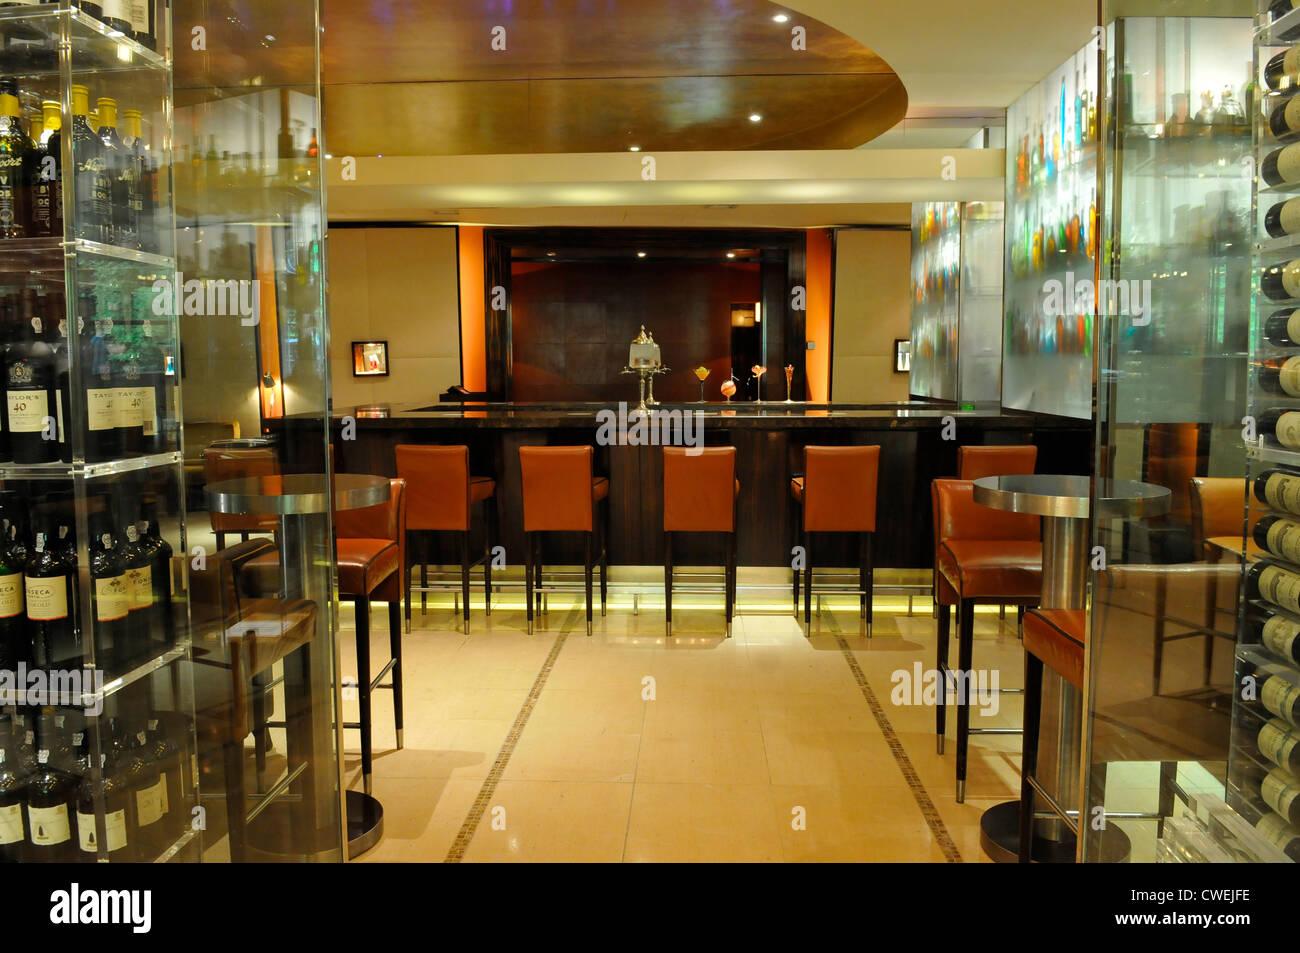 Bar at The Mandarin Oriental Hotel, Knighsbridge, London - Stock Image